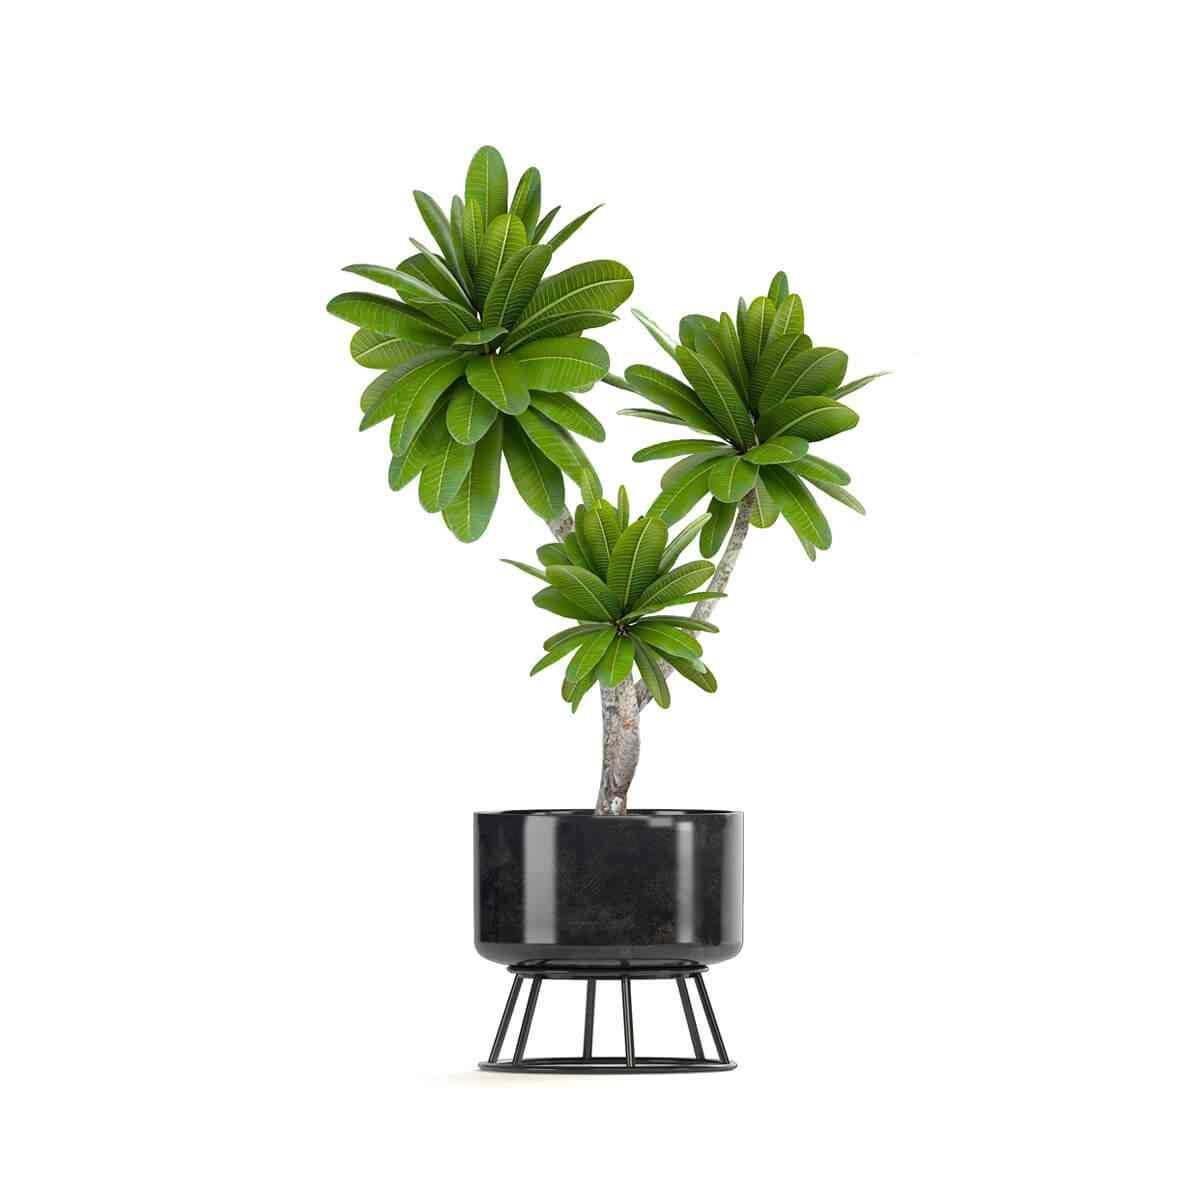 https://greenshade.com.au/wp-content/uploads/2018/09/product_08.jpg